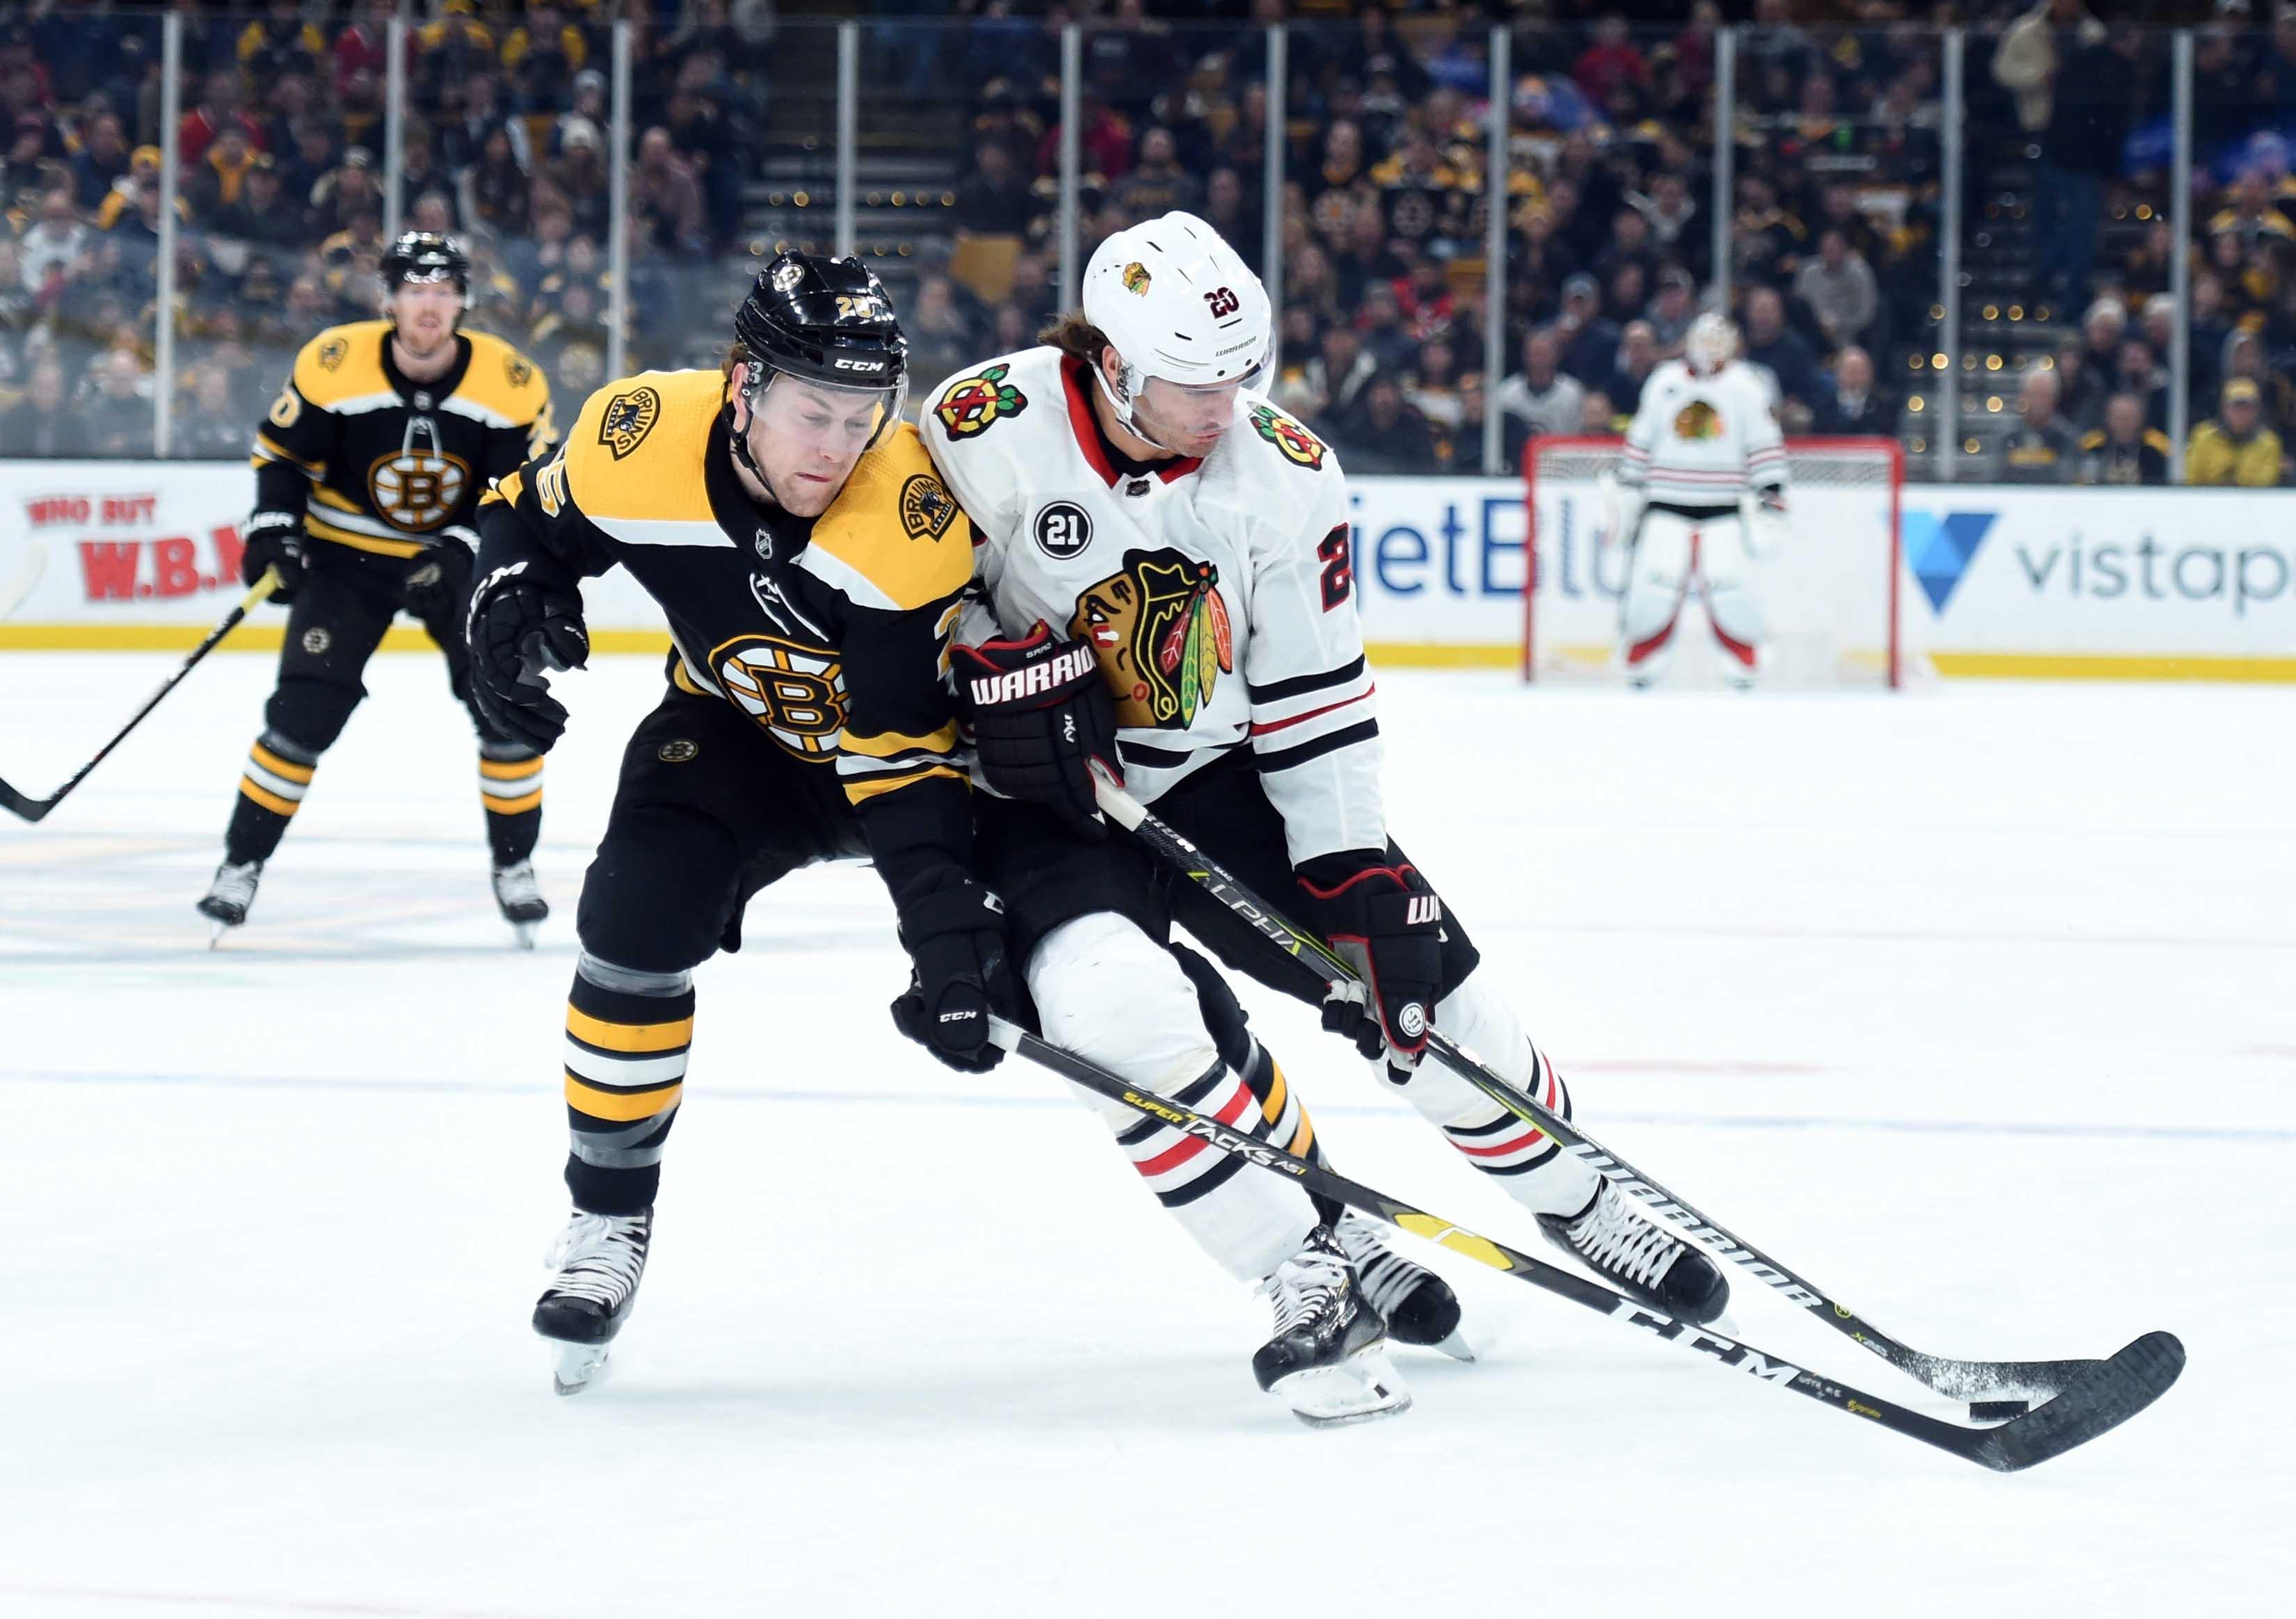 NHL: Chicago Blackhawks at Boston Bruins